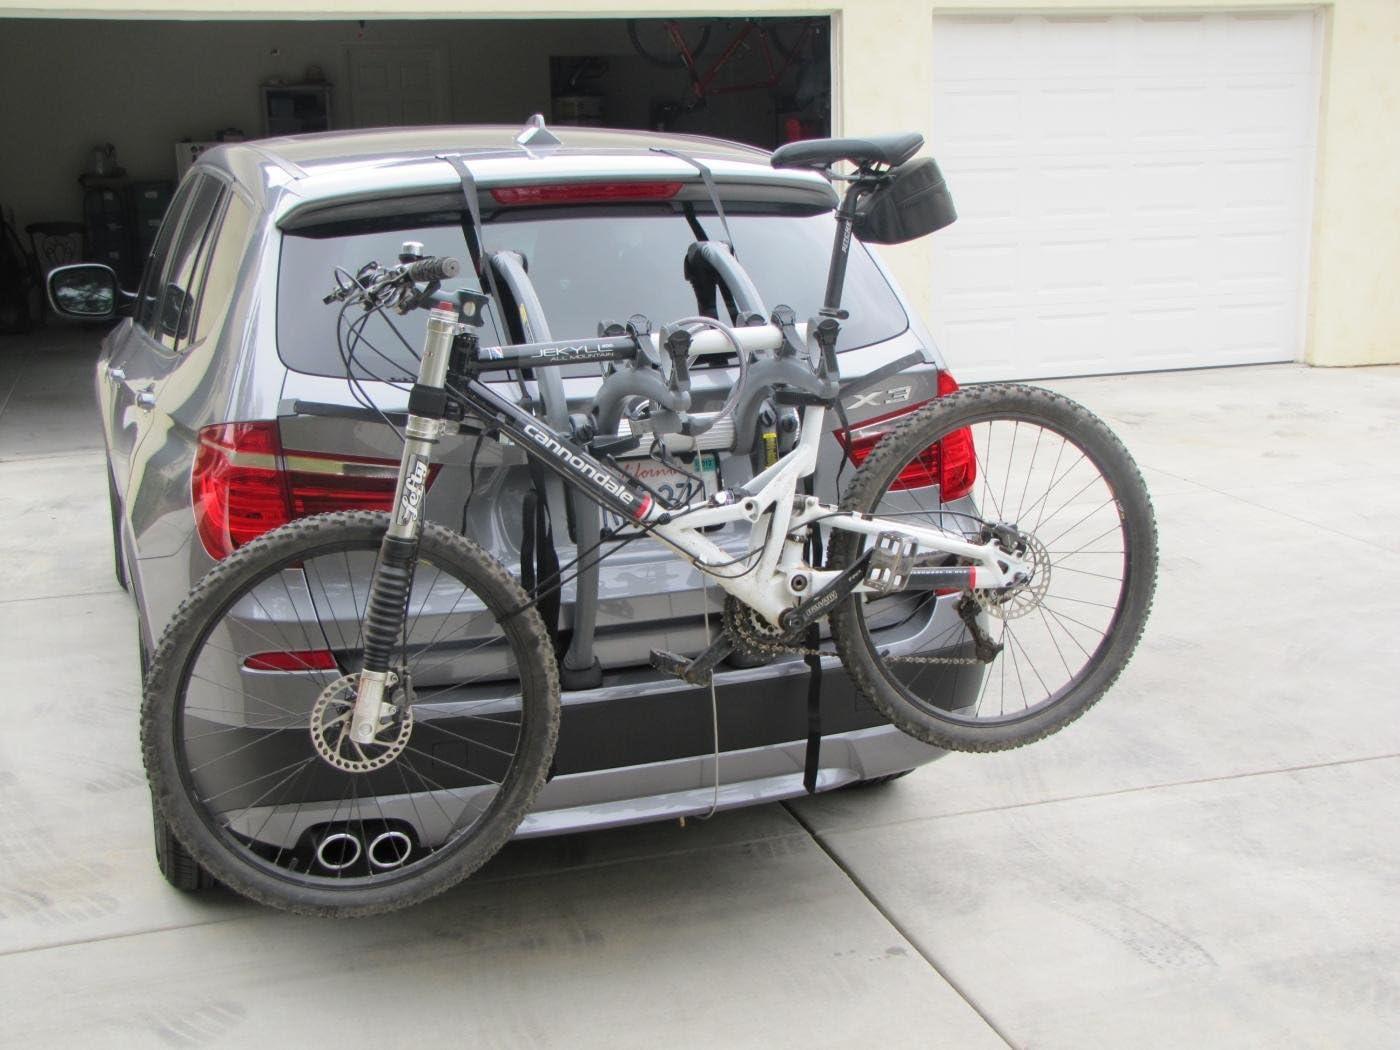 Bmw X3 Bike Rack Bike Rack Cycle Carrier Huggers With Flap Amazon De Auto